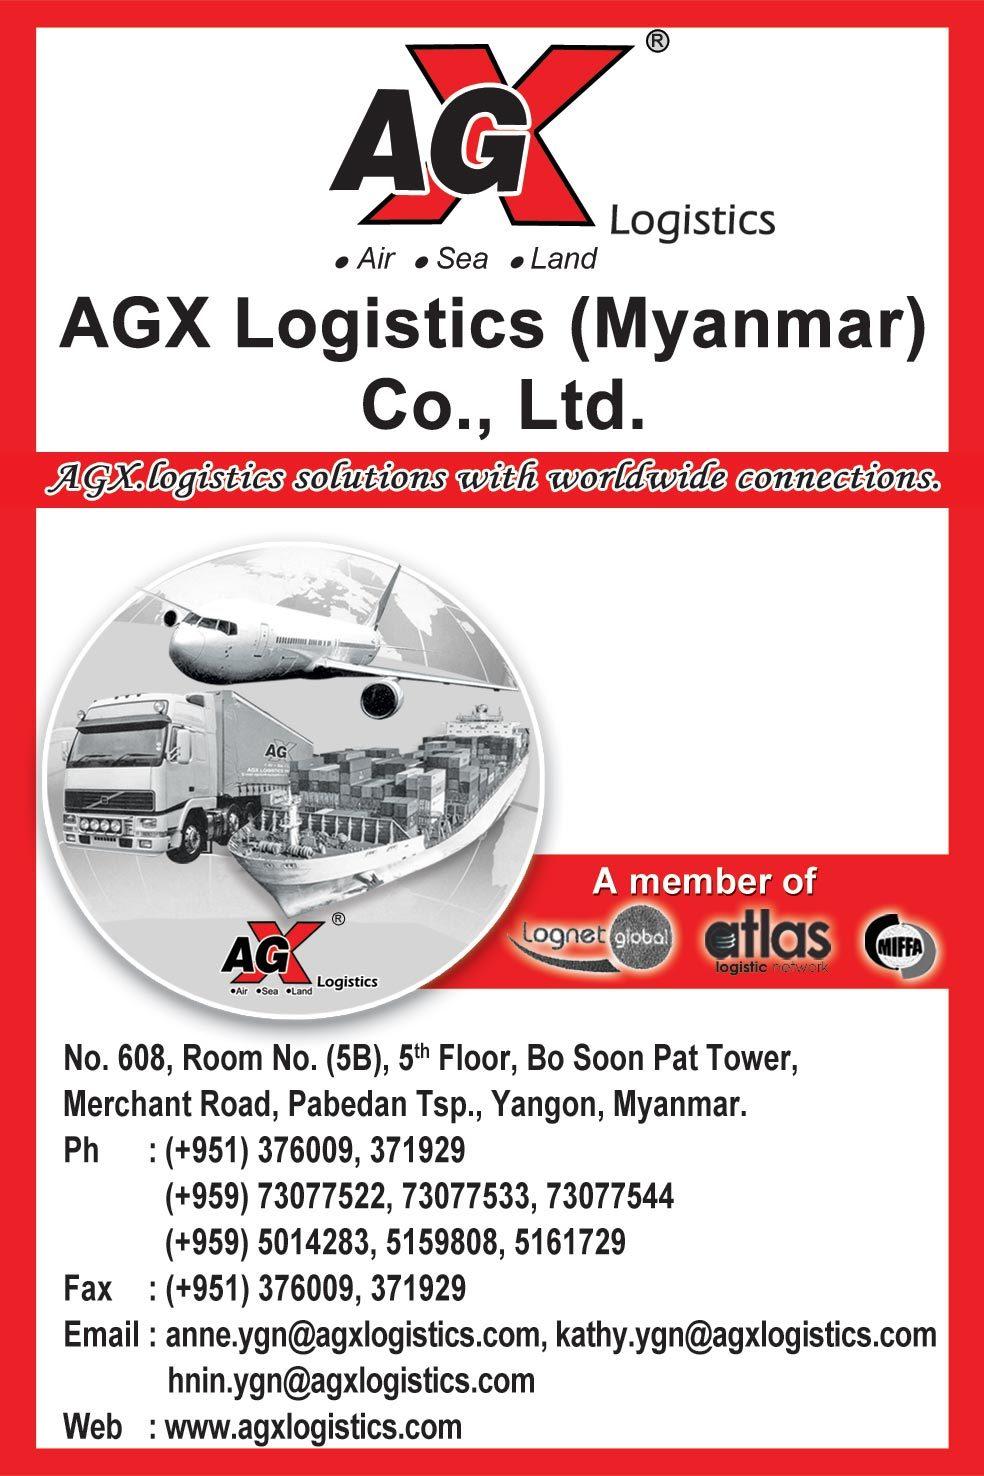 AGX-Logistics-(Myanmar)-Co-Ltd_Freignt-Forwarders_(A)_138.jpg